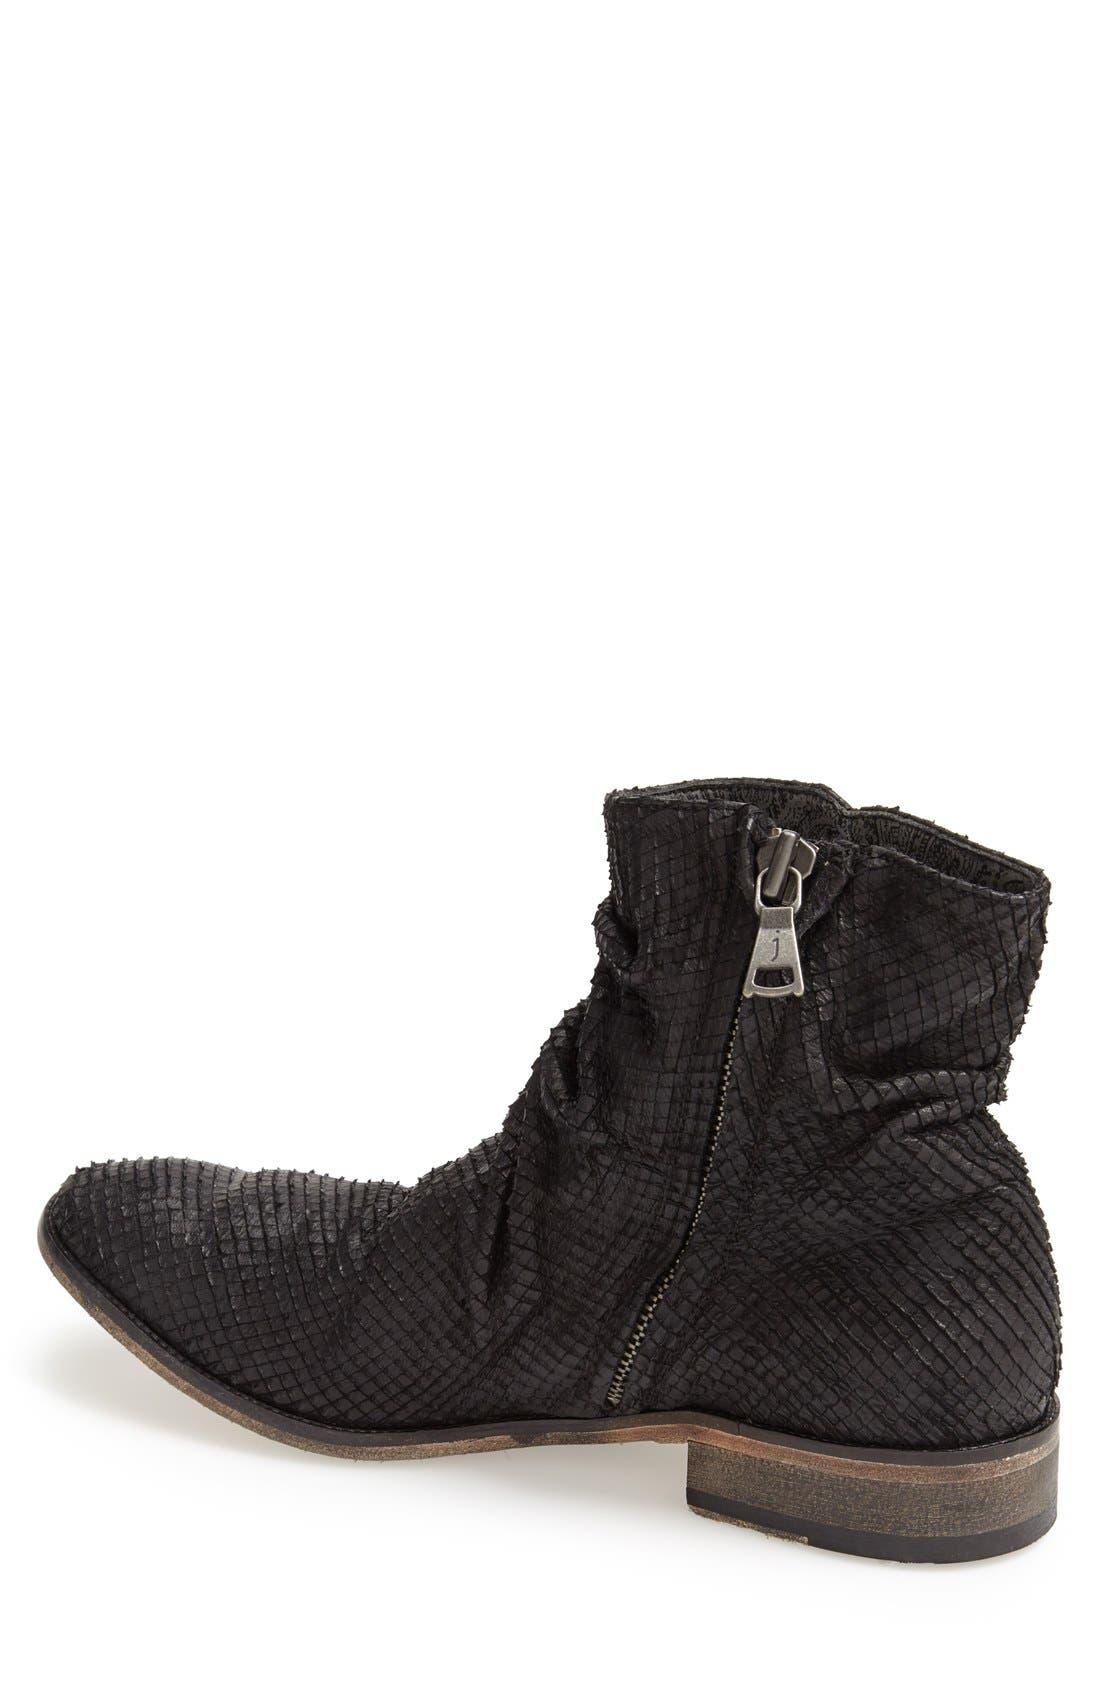 JOHN VARVATOS, Collection 'Richards - Sharpei' Zip Boot, Alternate thumbnail 3, color, 001